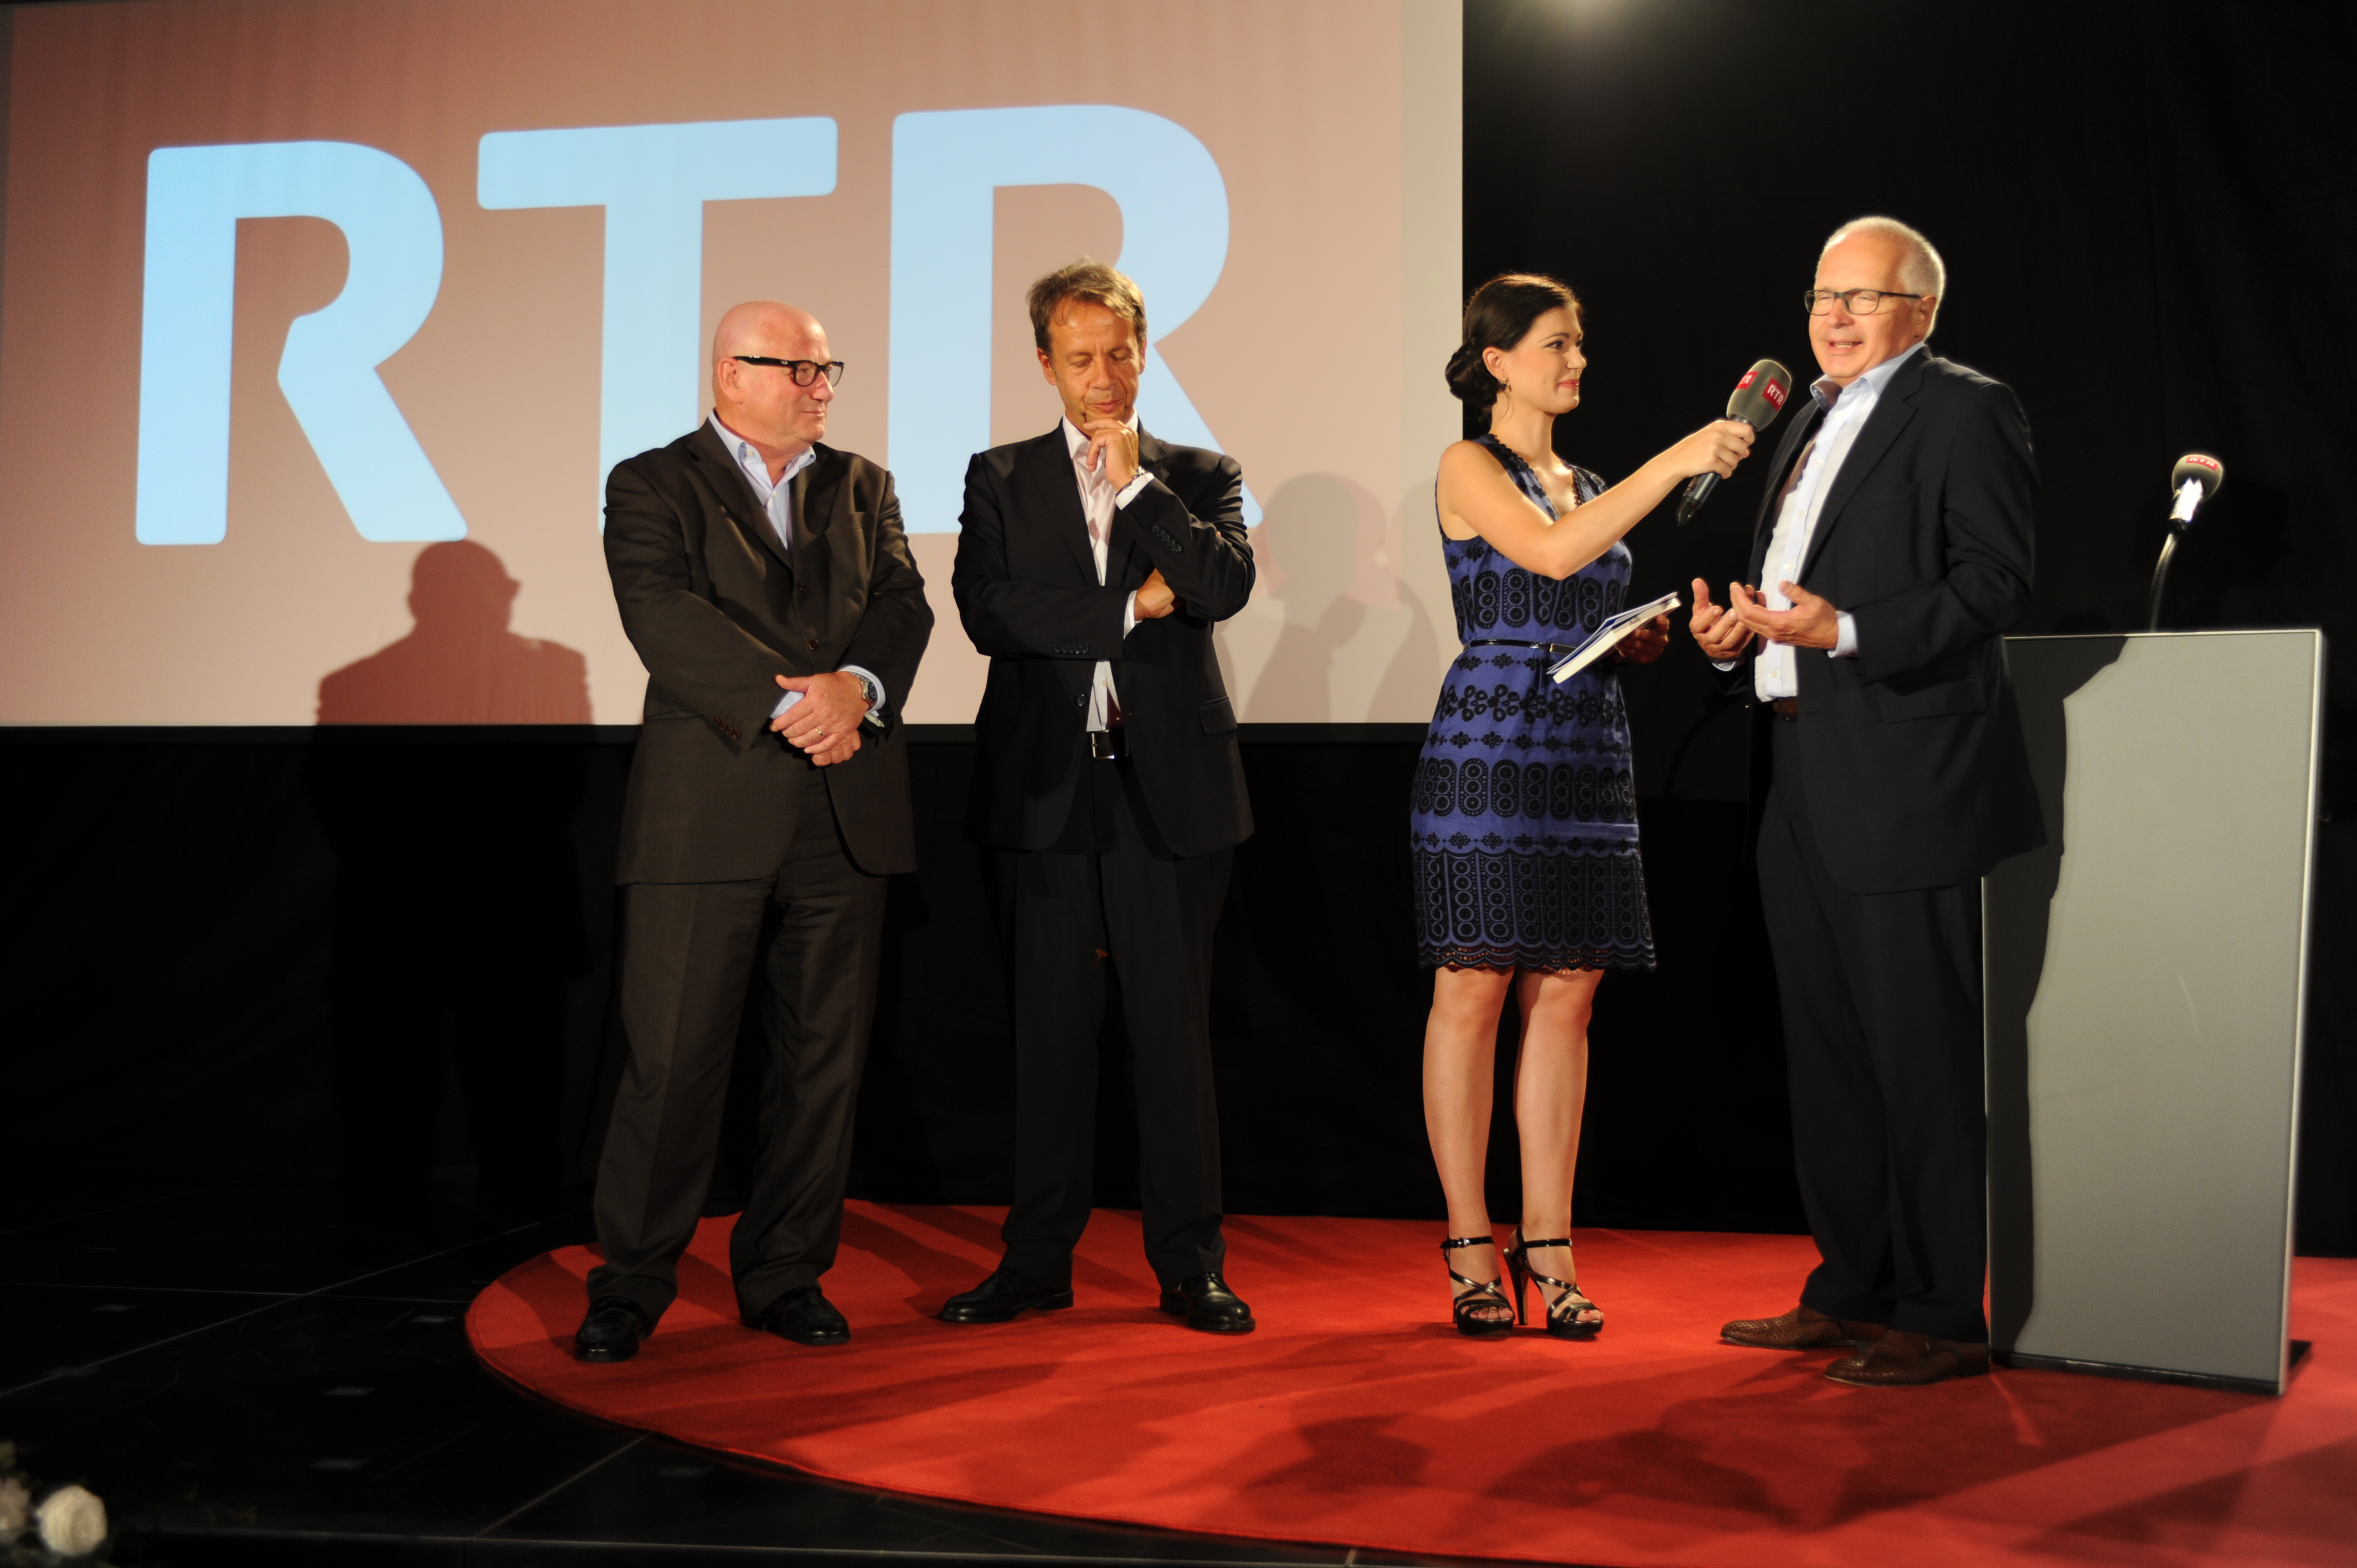 Per Ruedi Matter, directur SRF, èn ils programs dad RTR adina bainvis ed in enritgiment sin ils chanals dad SRF.